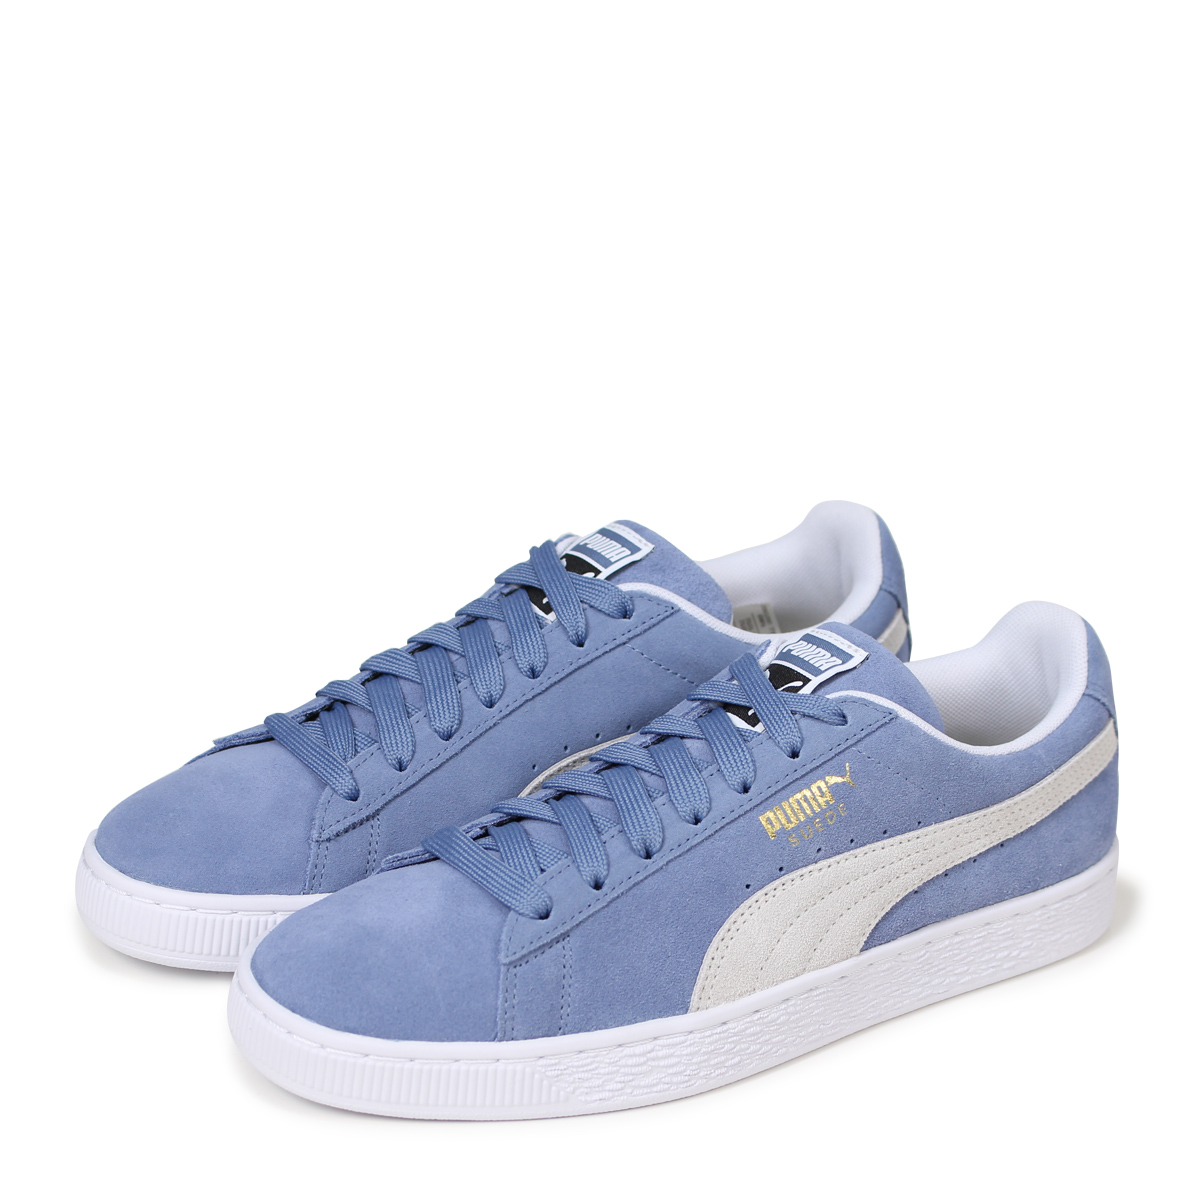 huge selection of d3d24 0ecf7 PUMA SUEDE CLASSIC Puma suede classical music sneakers men 365,347-03 blue   4  ...